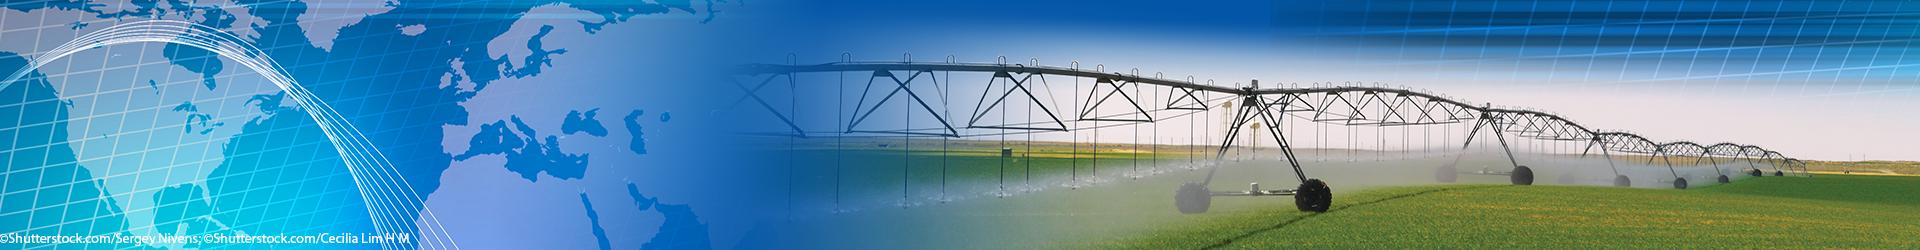 Irrigation equipment. (Background: Copyright Shutterstock.com/Sergey Nivens; right: Copyright Shutterstock.com/Cecilia Lim H M)